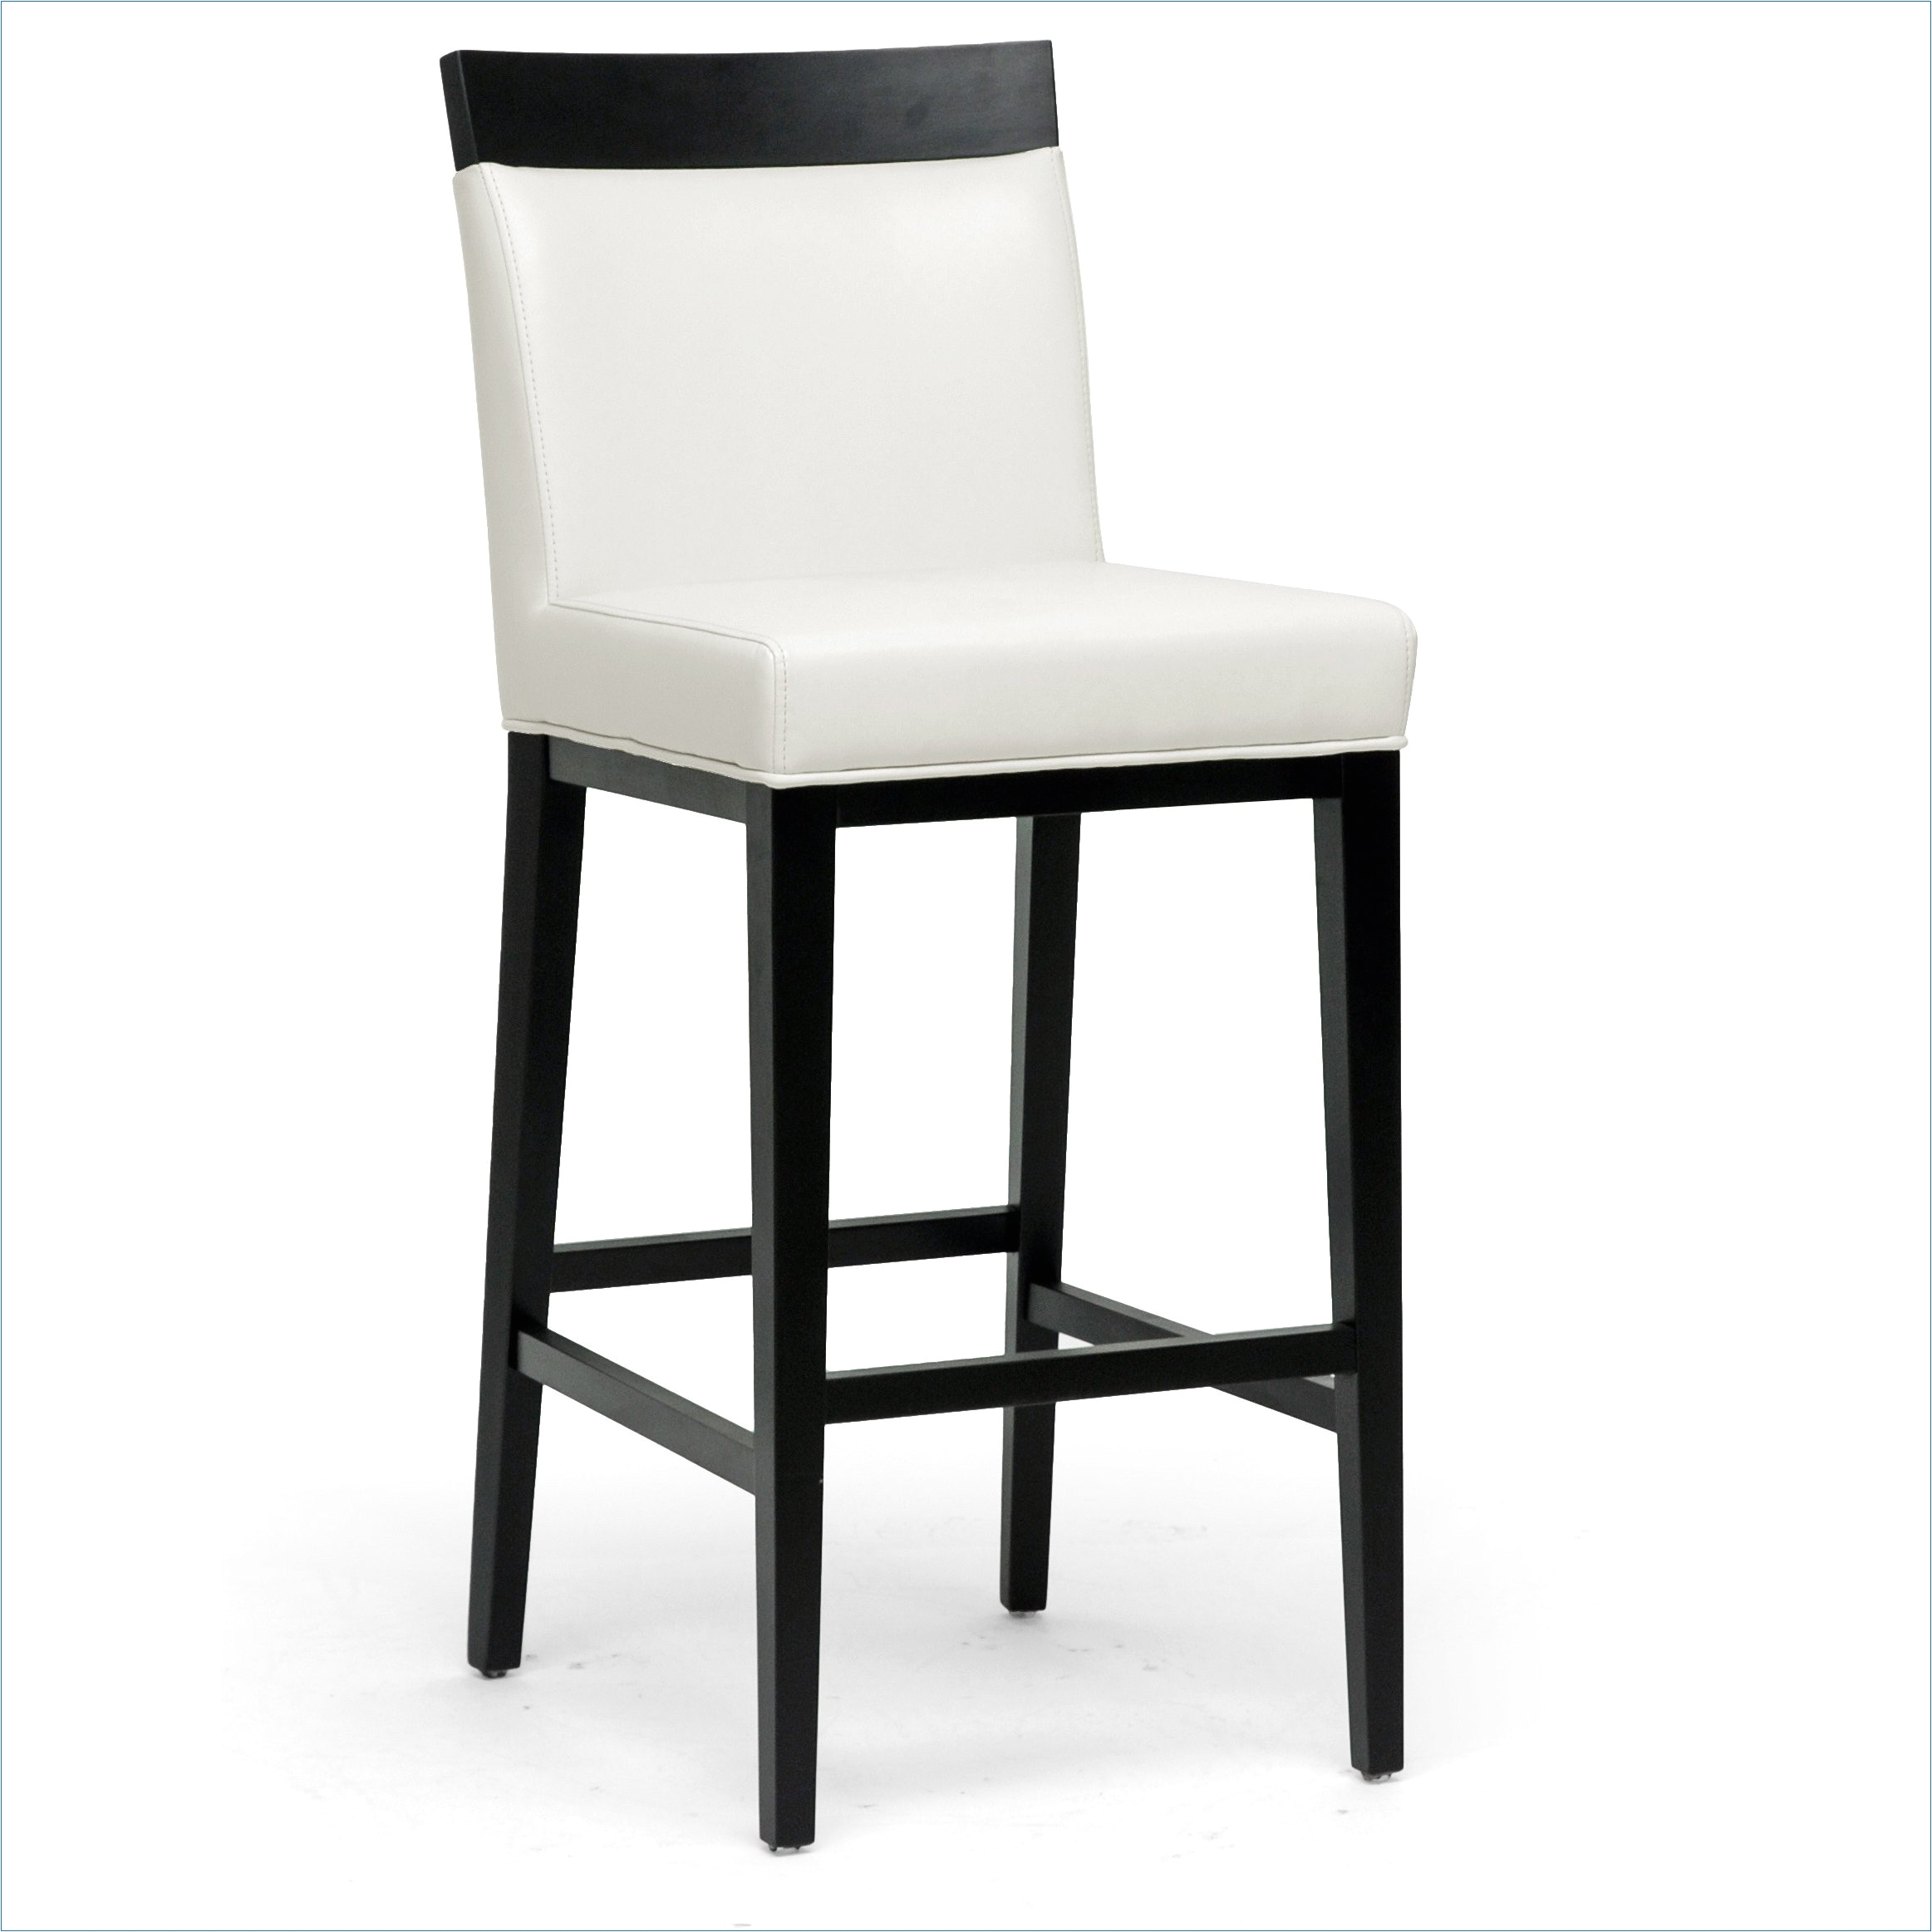 Ikea Black Wooden High Chair 66 Beautiful Luxurious Bar Stools Ikea  Bernhard Chair To Barstool